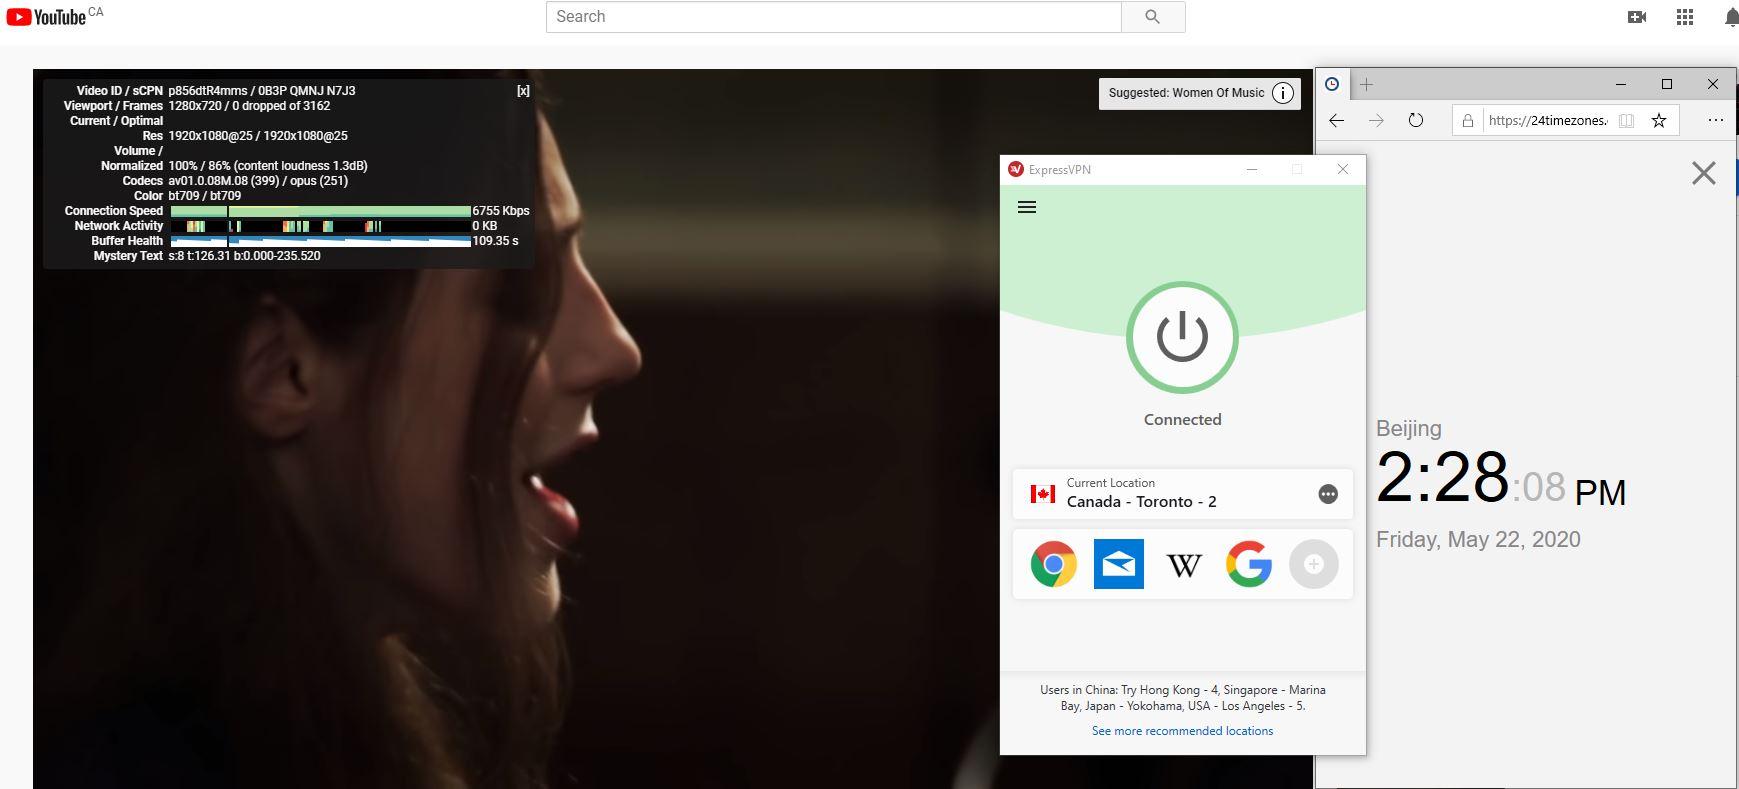 Windows10 ExpressVPN Canada - Toronto - 2 中国VPN 翻墙 科学上网 youtube测速-20200522